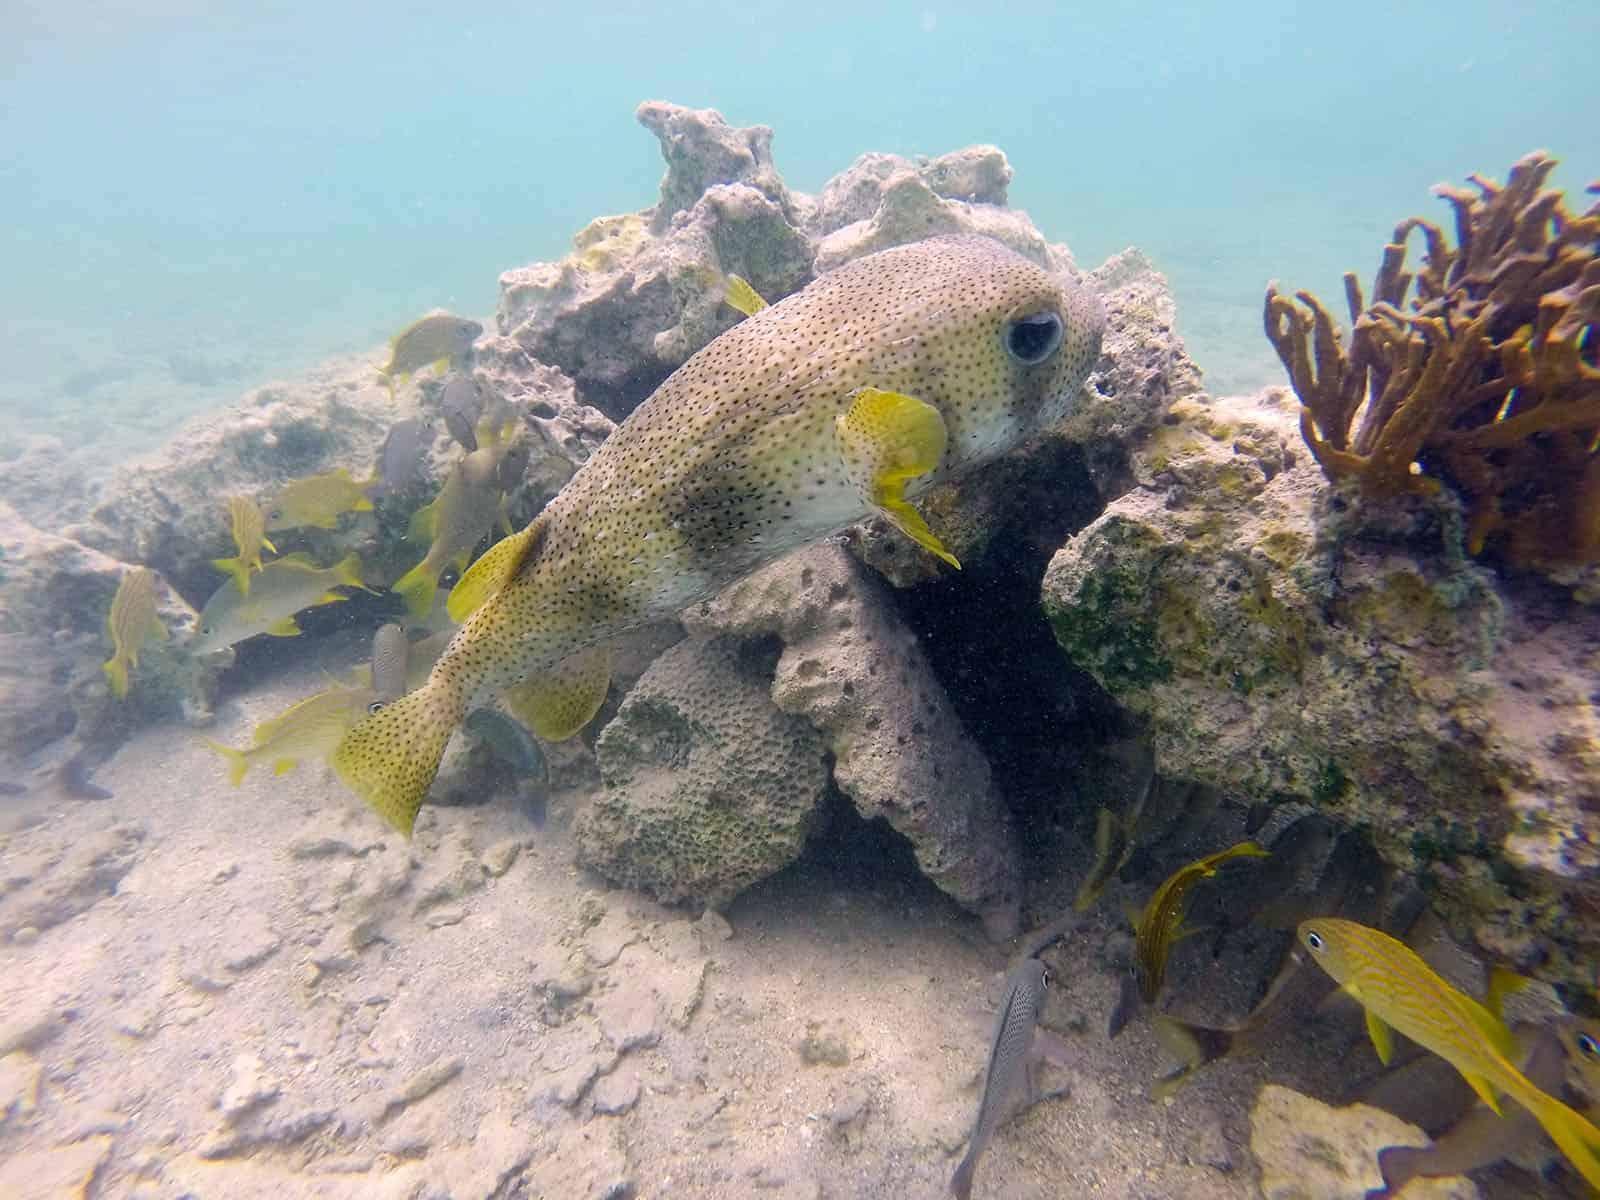 St Thomas Ecotour at Cas Cay Mangrove Lagoon and Wildlife Sanctuary